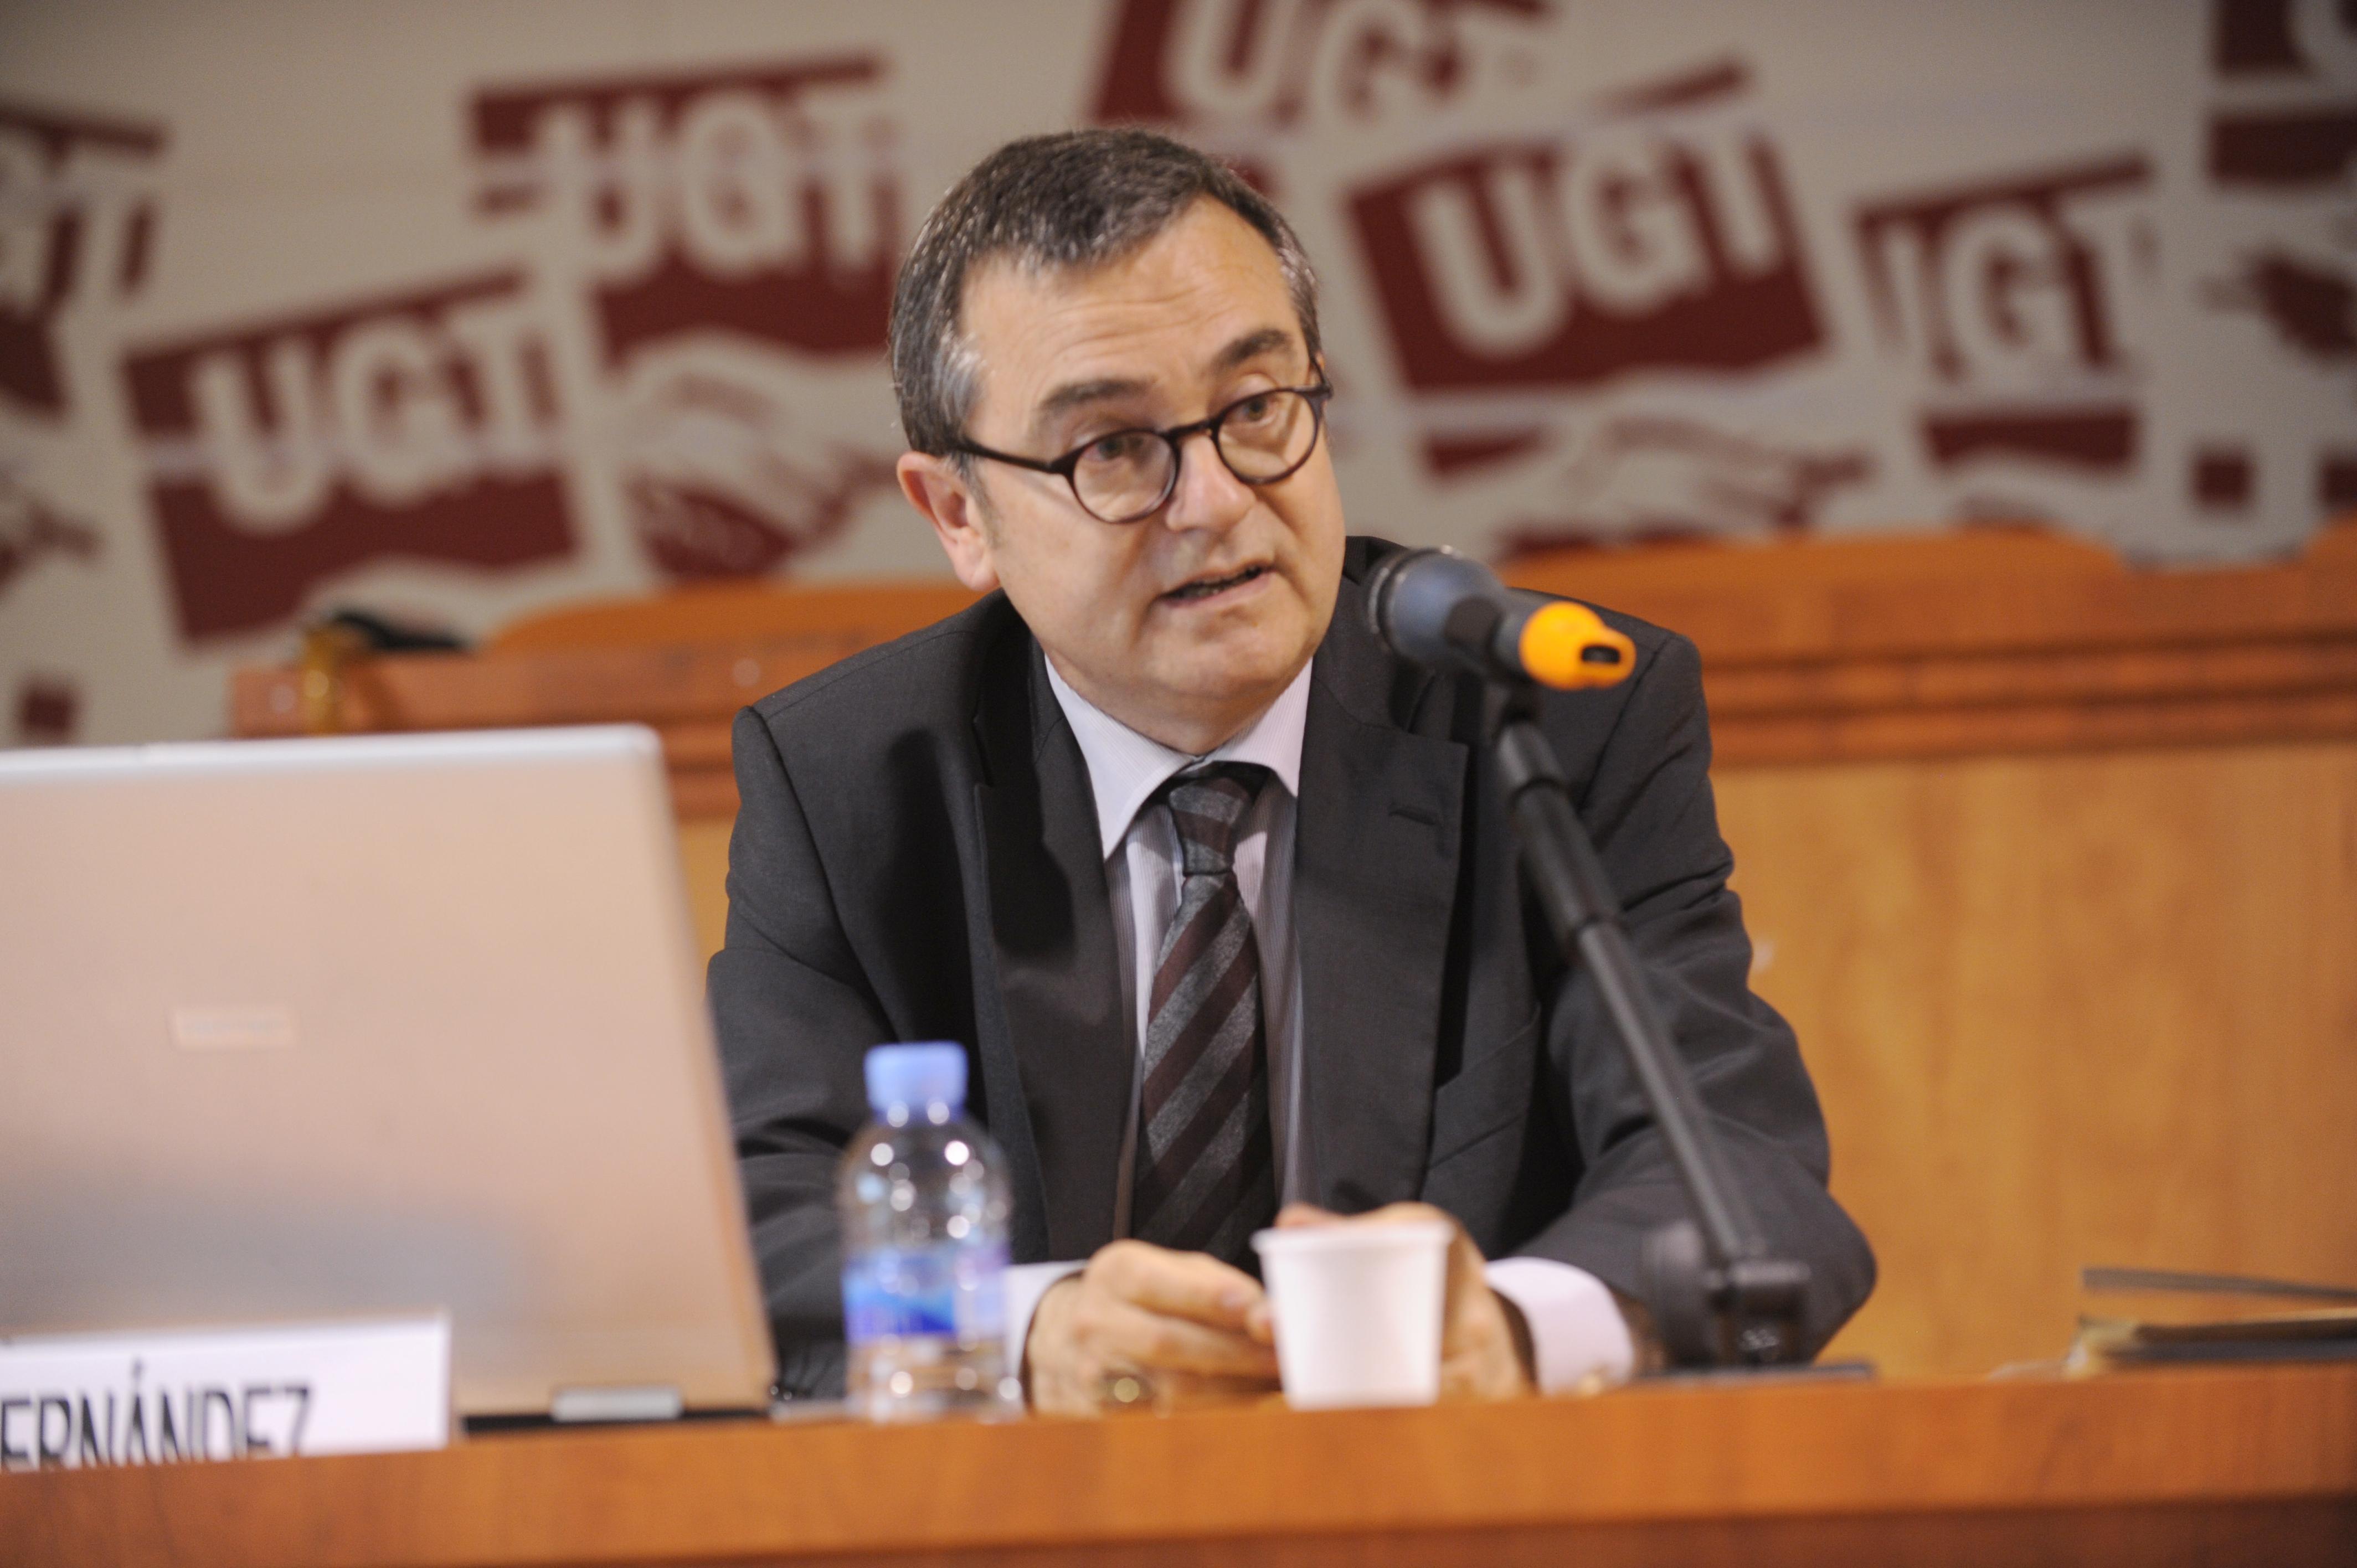 Joan Miquel Hernández